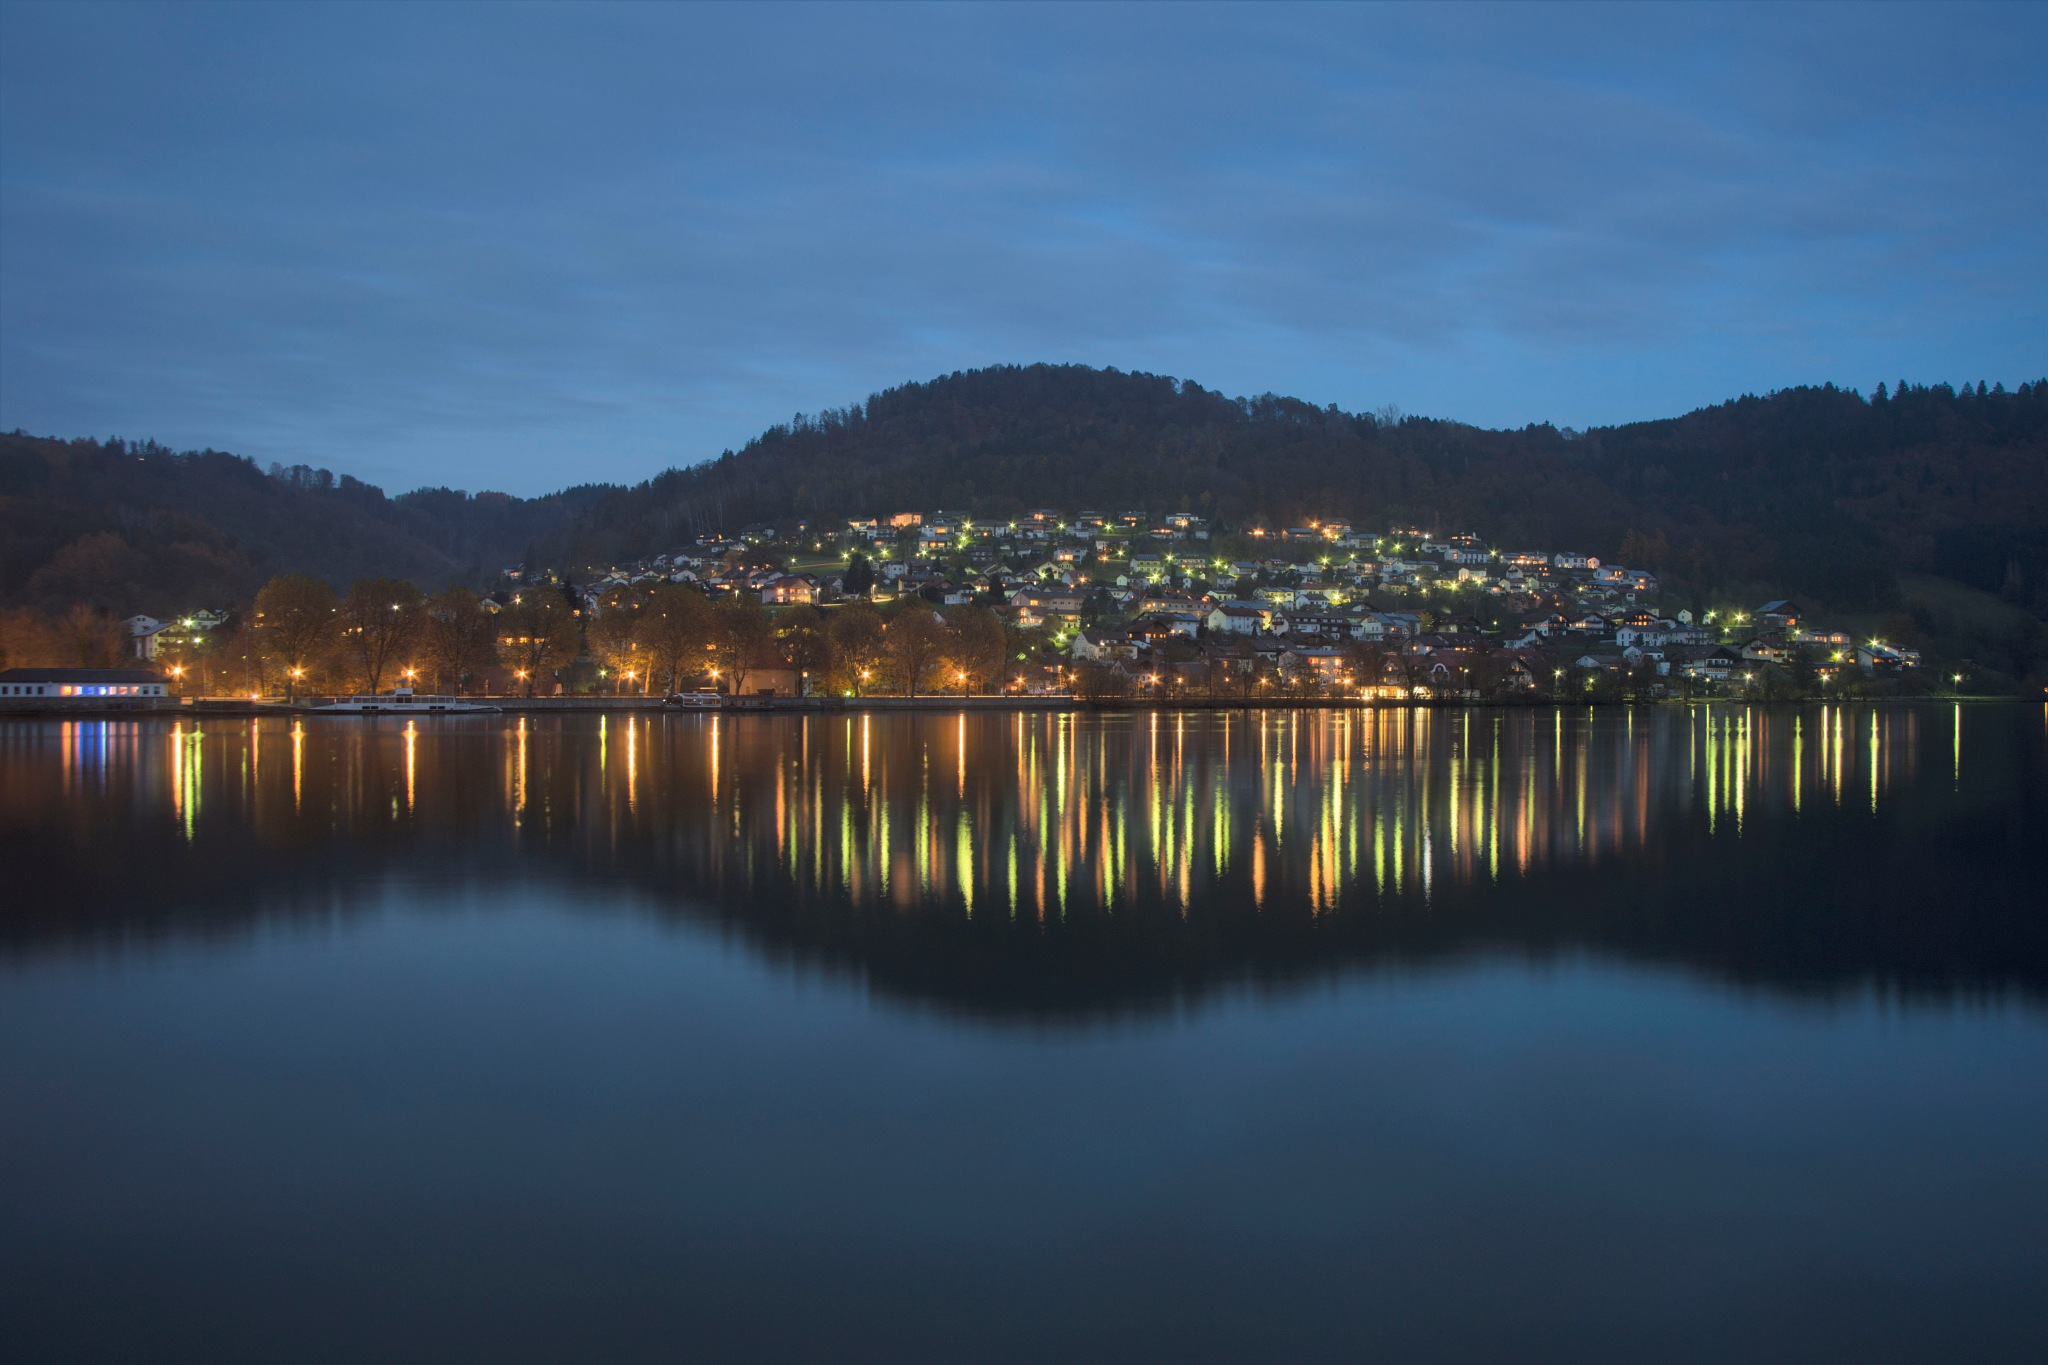 Obernzell at Night by FalcoM